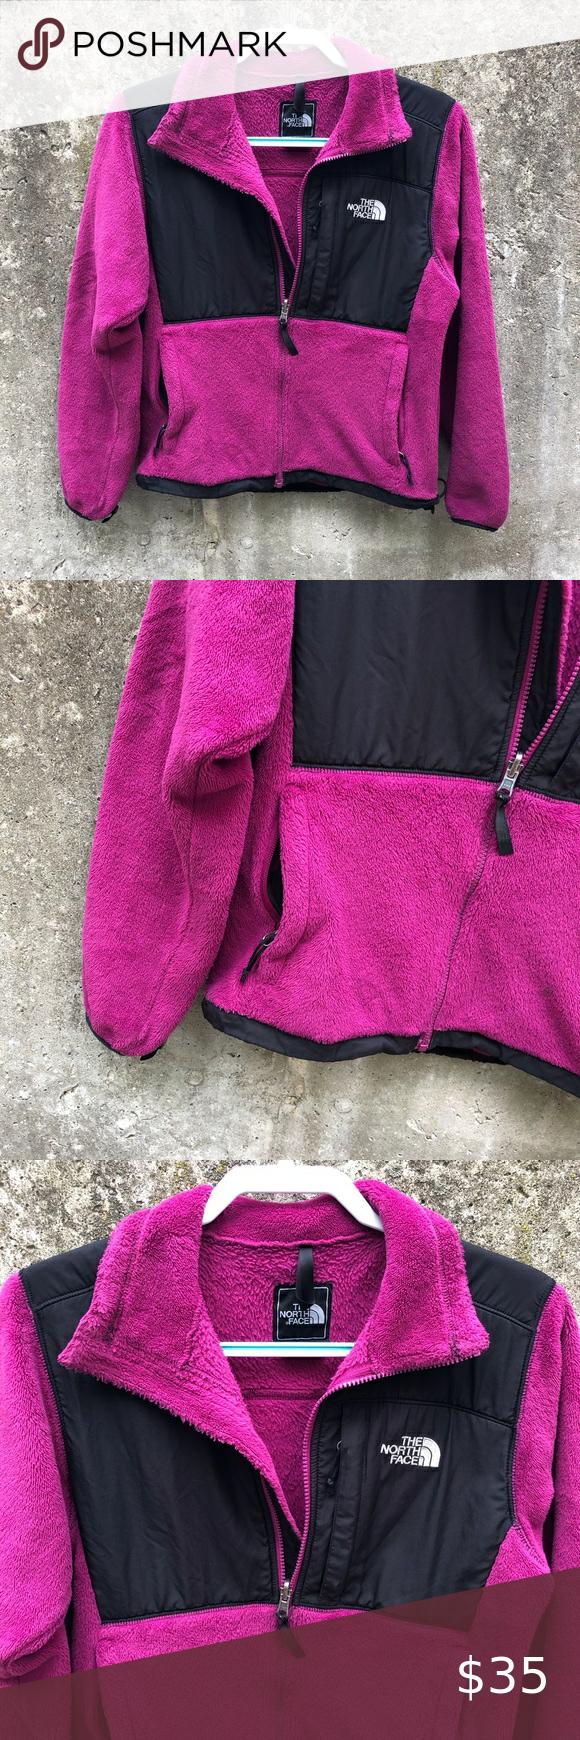 The North Face Denali Jacket Grey North Face Jacket Fleece Hoodie Jacket Clothes Design [ 1740 x 580 Pixel ]